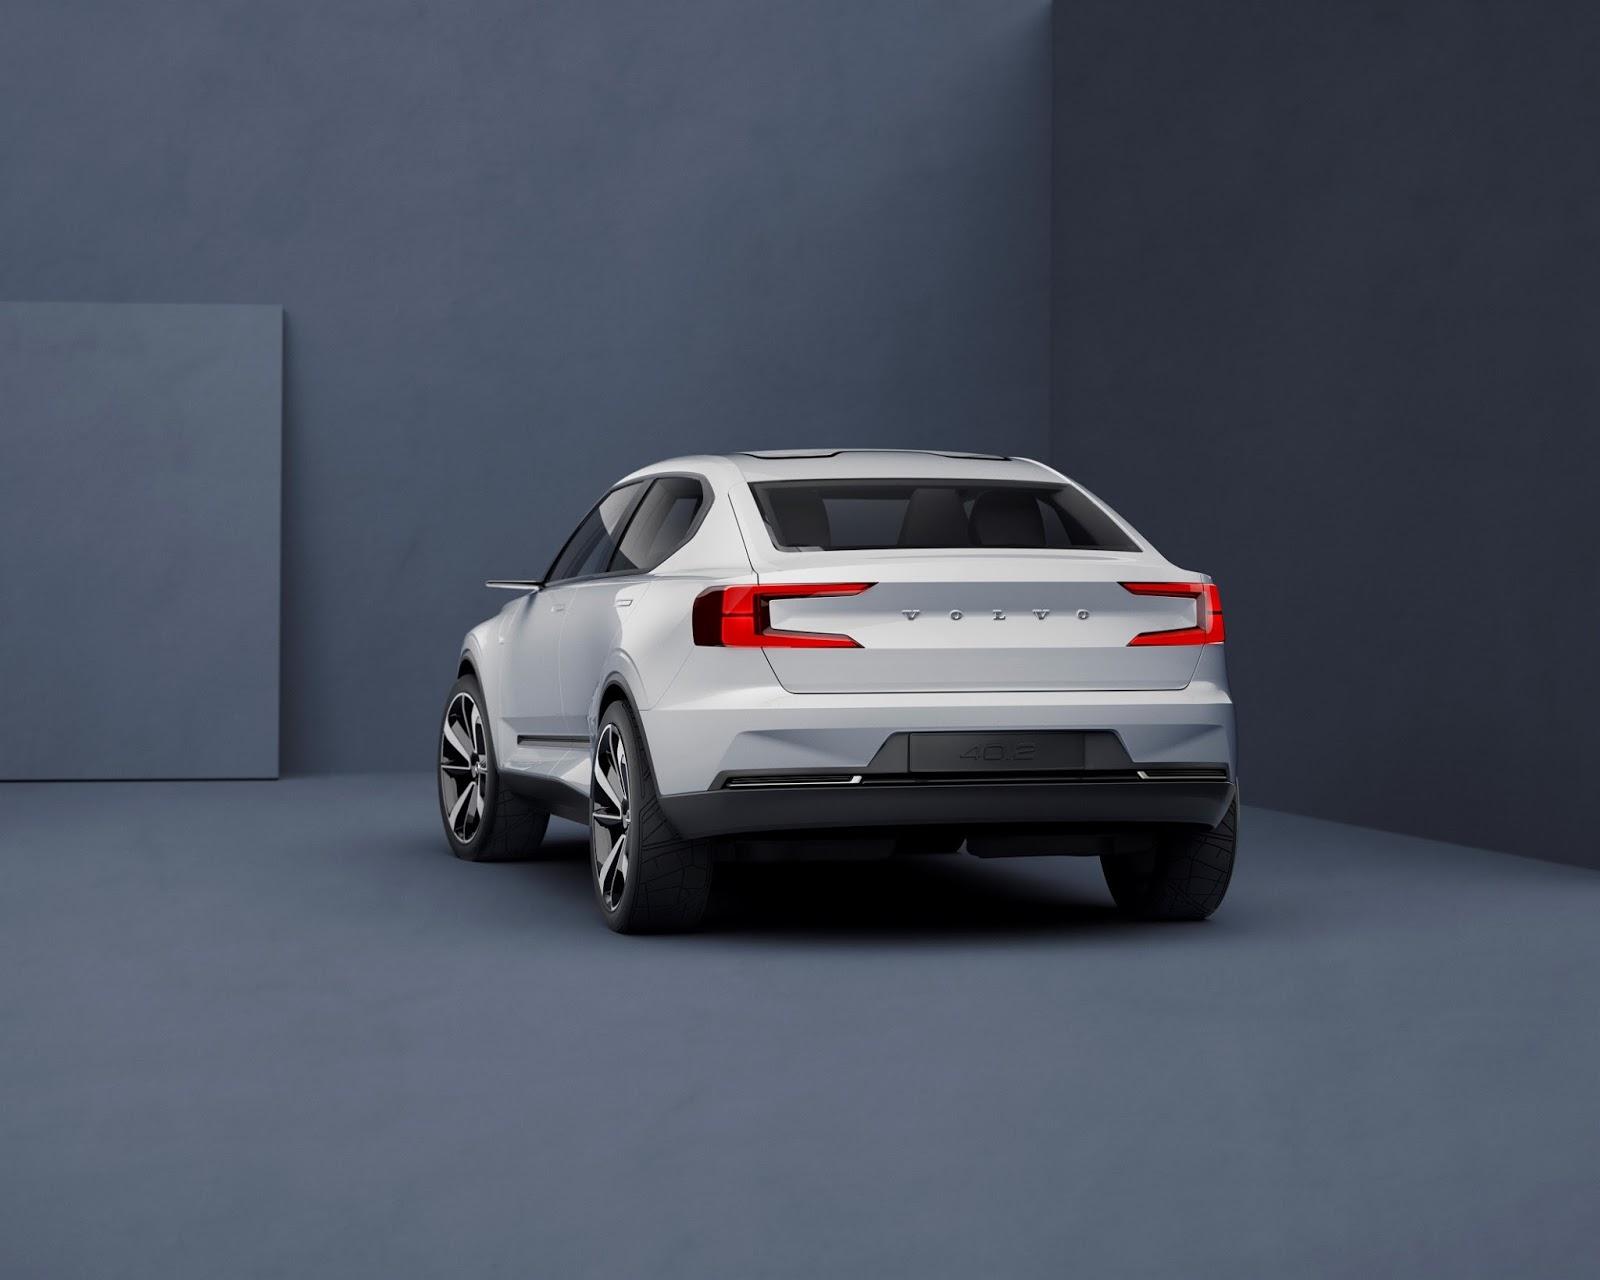 VOLVO2BCONCEPT 40 2 rear quarter low Δύο νέα πρωτότυπα από τη Volvo (XC40 & S40) Volvo, Volvo S40, Volvo XC40